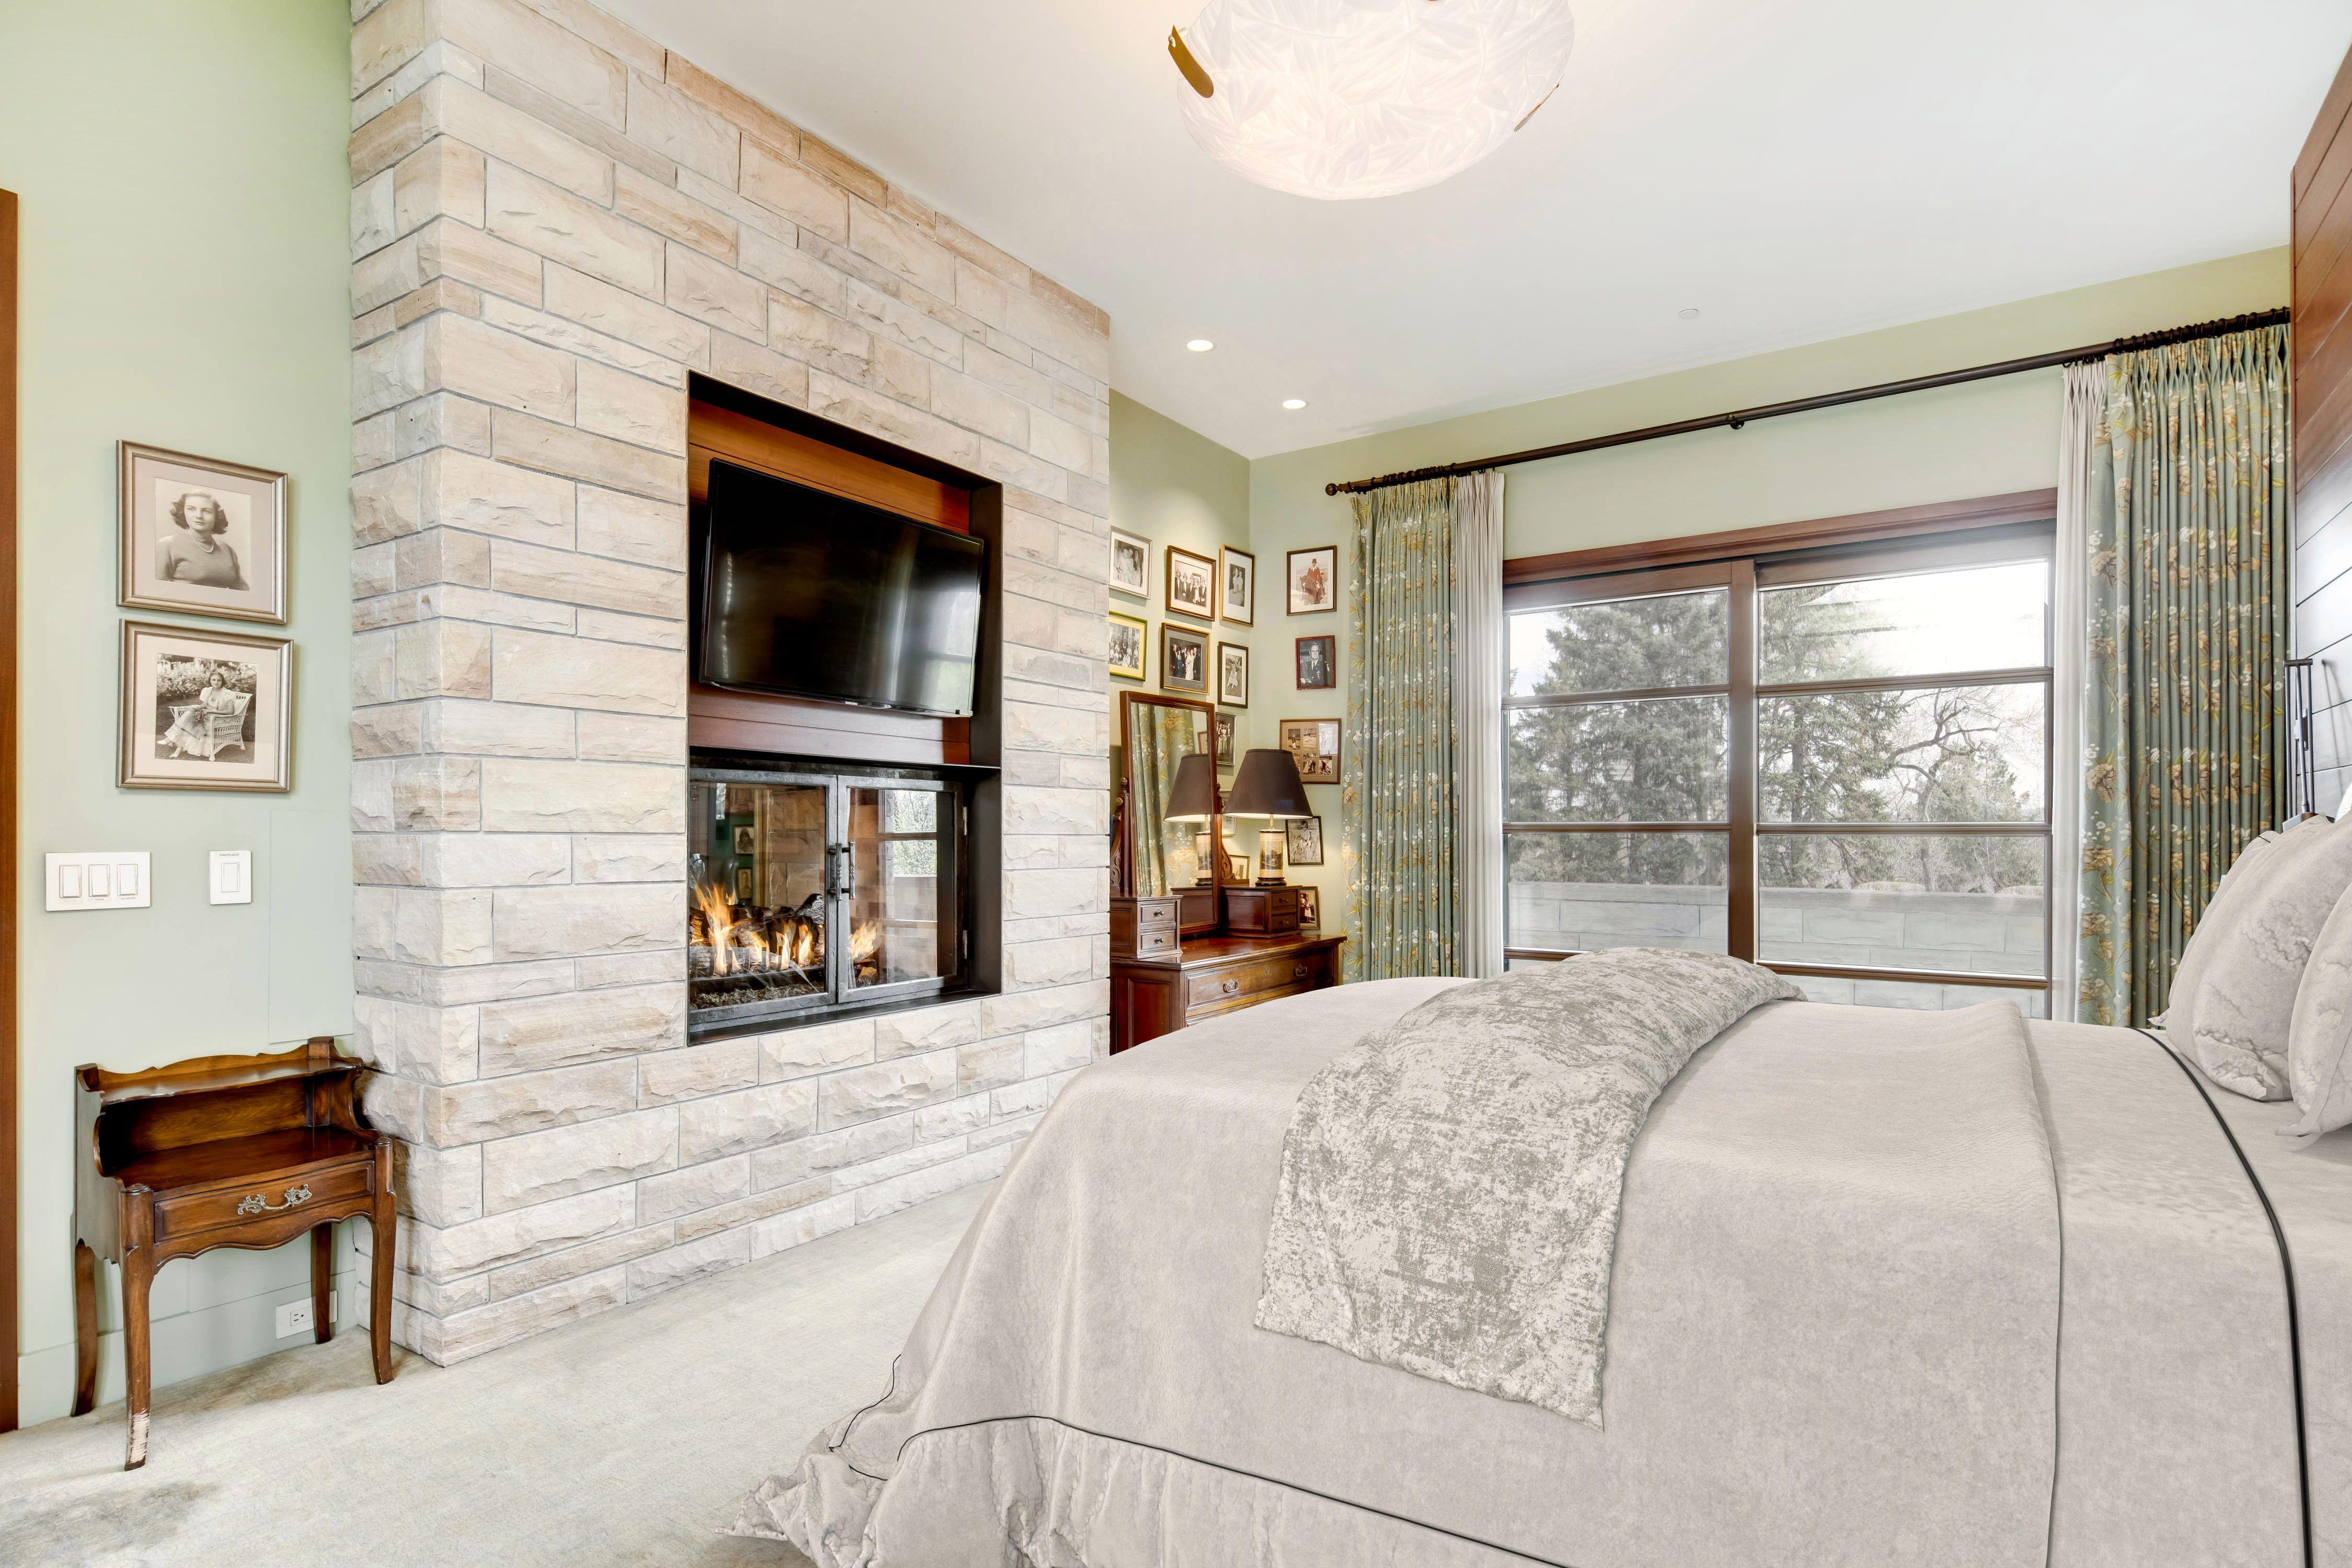 9 Polo Club Ln bedroom